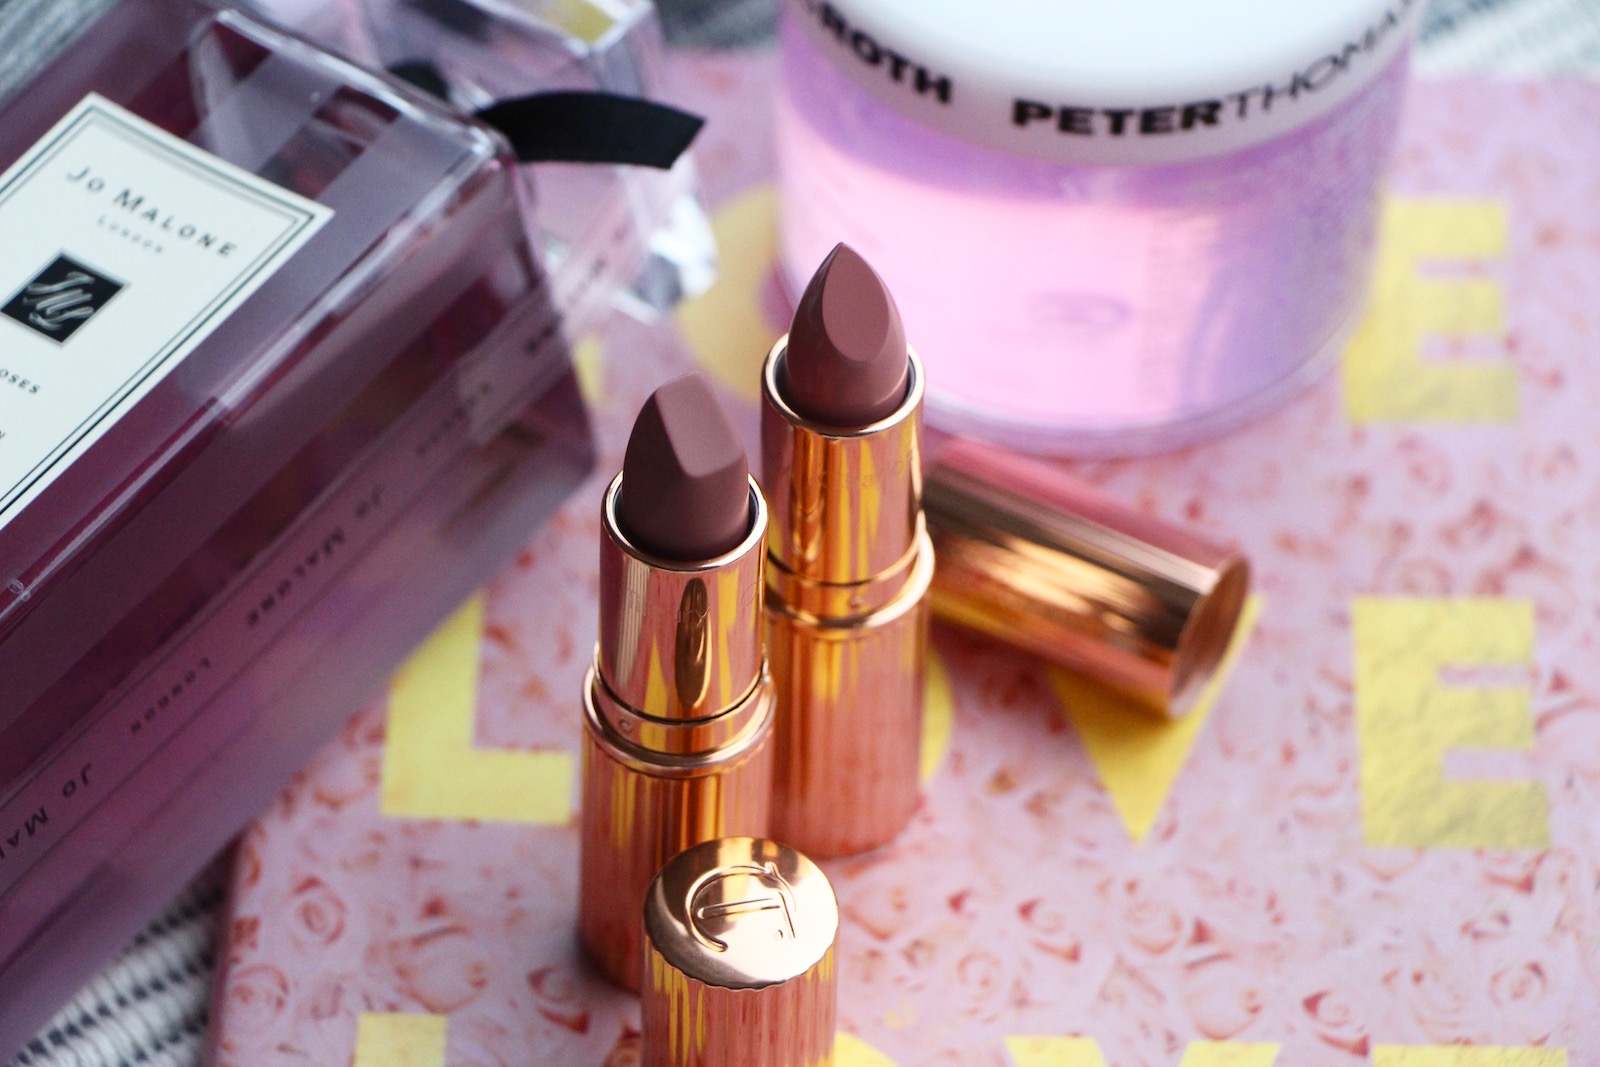 charlotte tilbury valentine lipstick